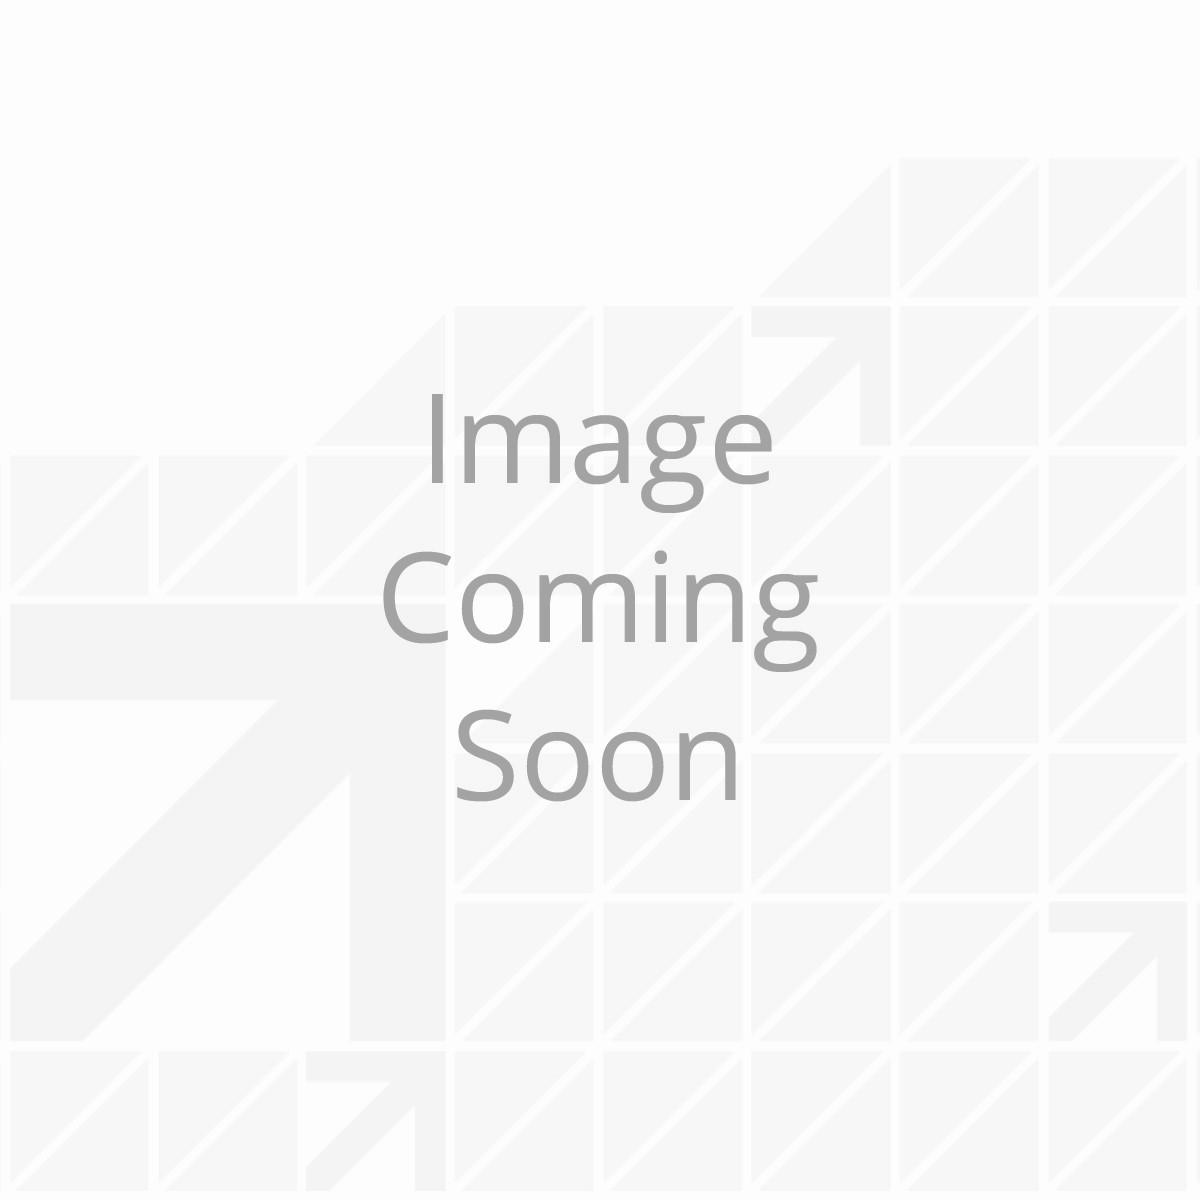 Plate 6.95 X 3.8 Pc Black